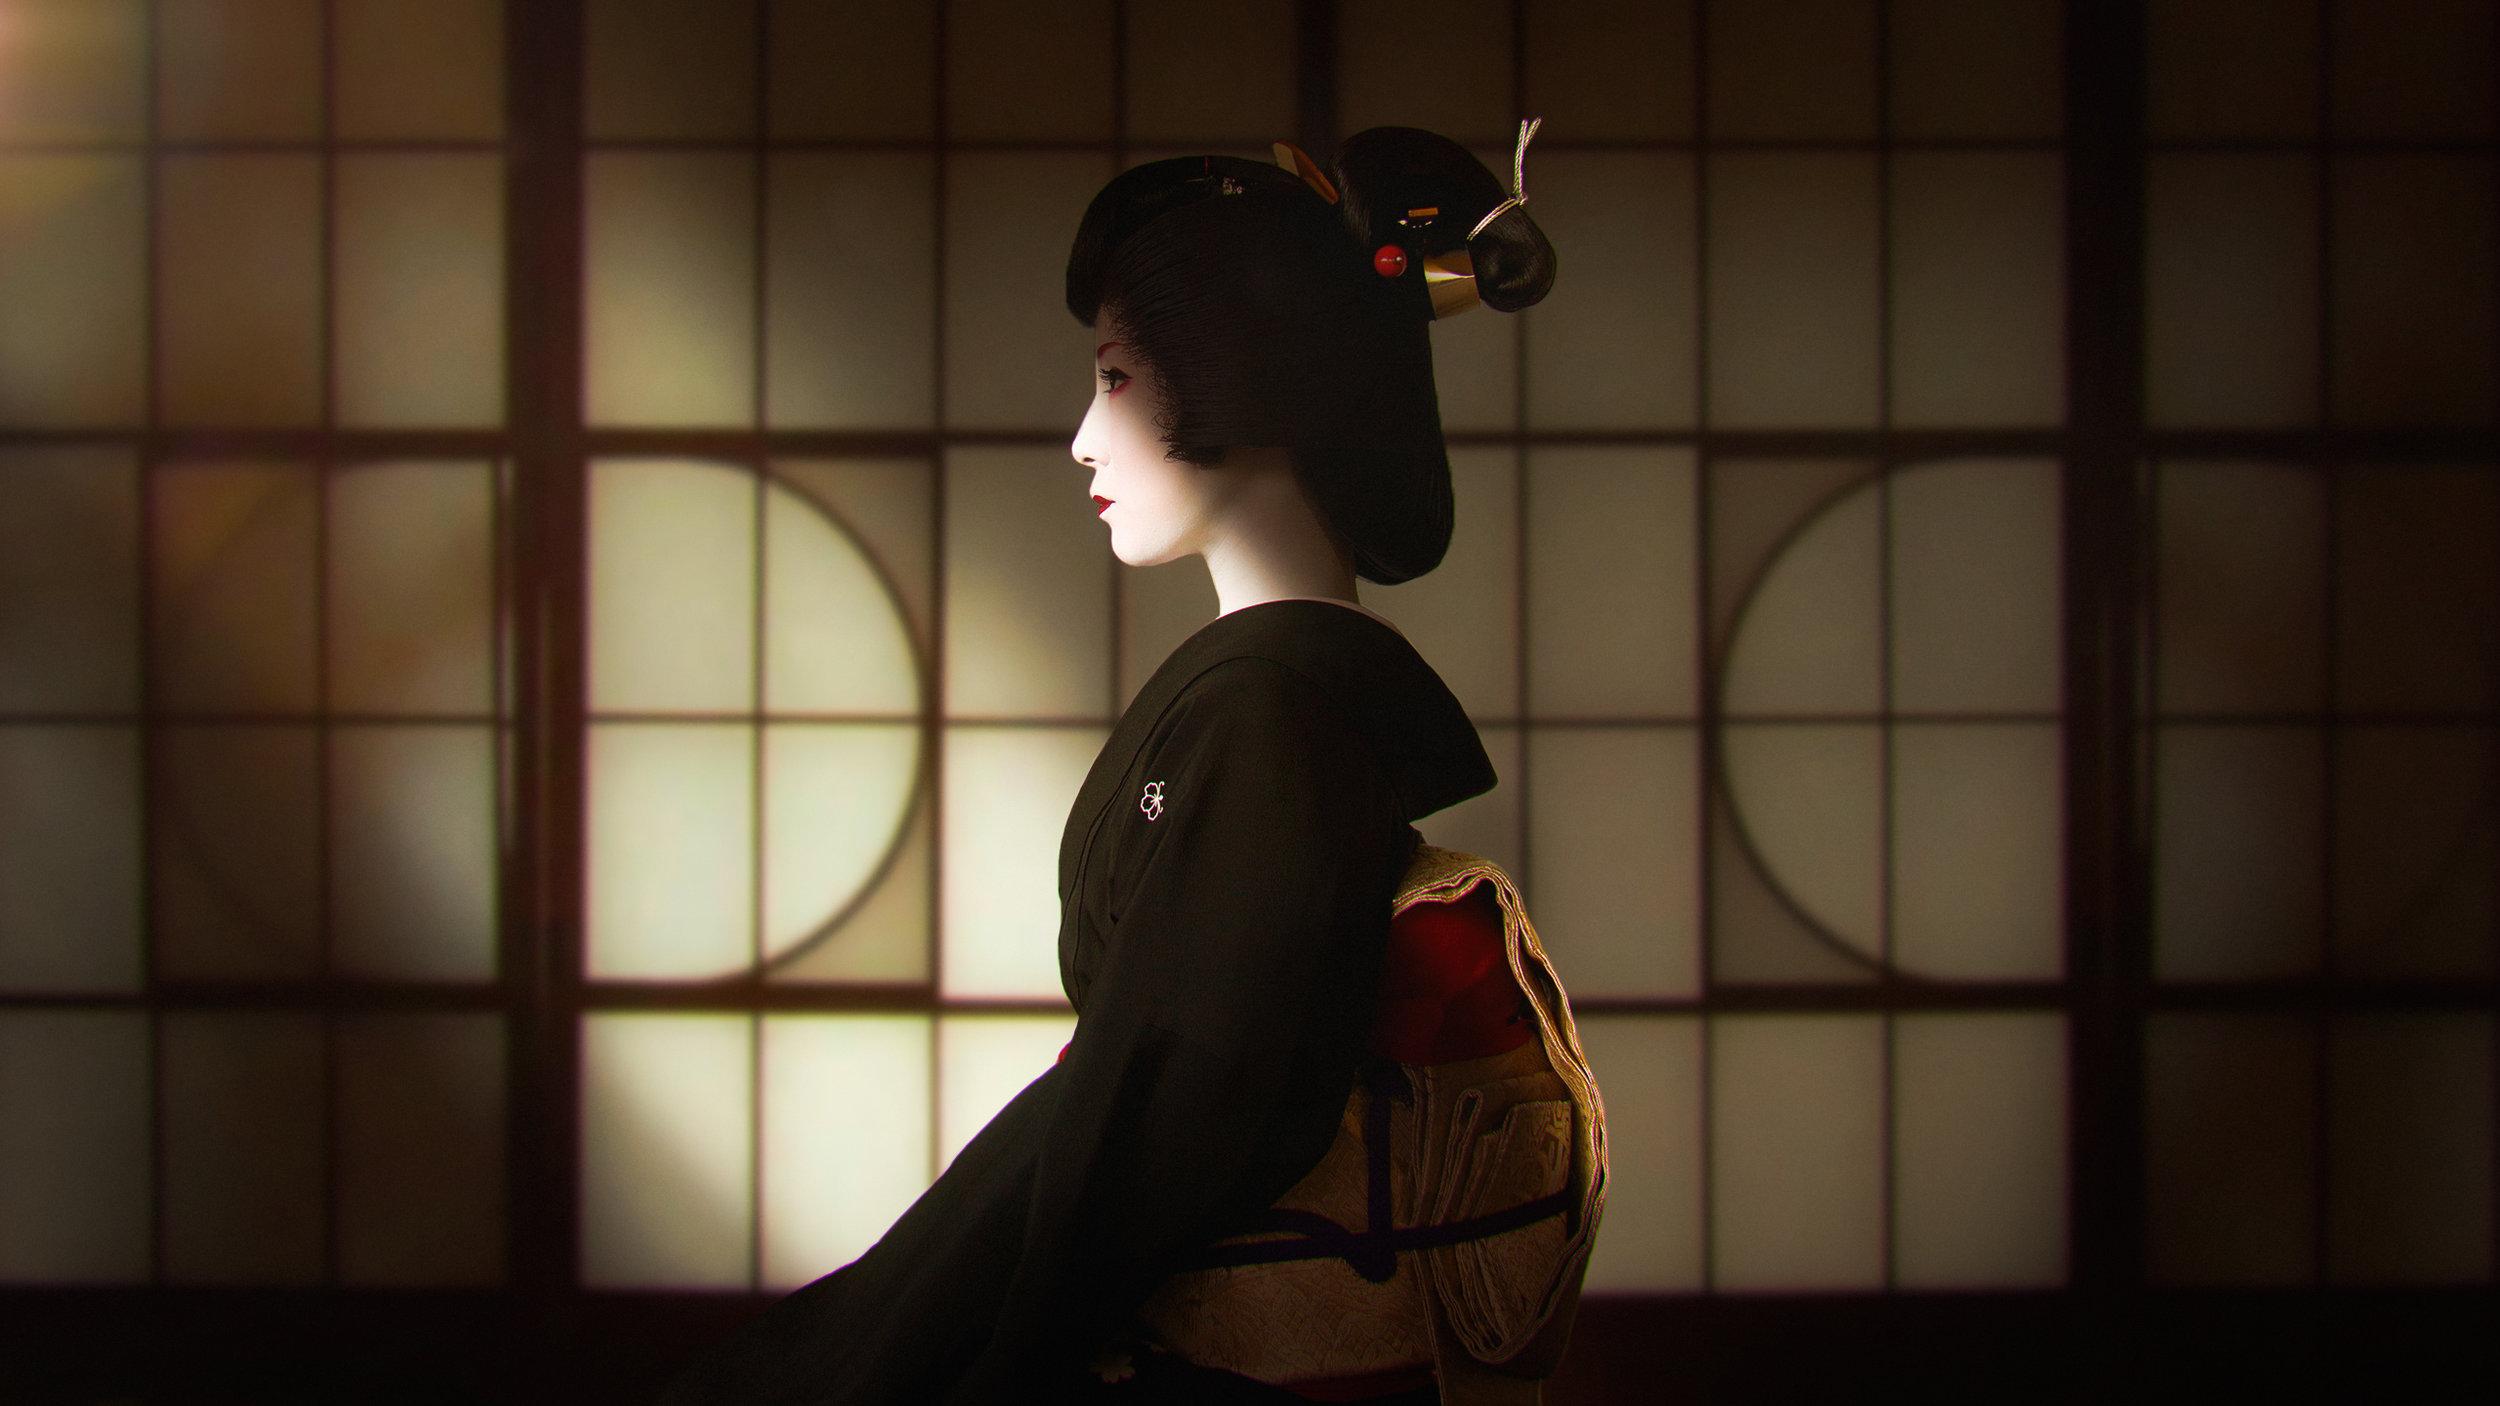 01_Terror_Geisha_v04.jpg